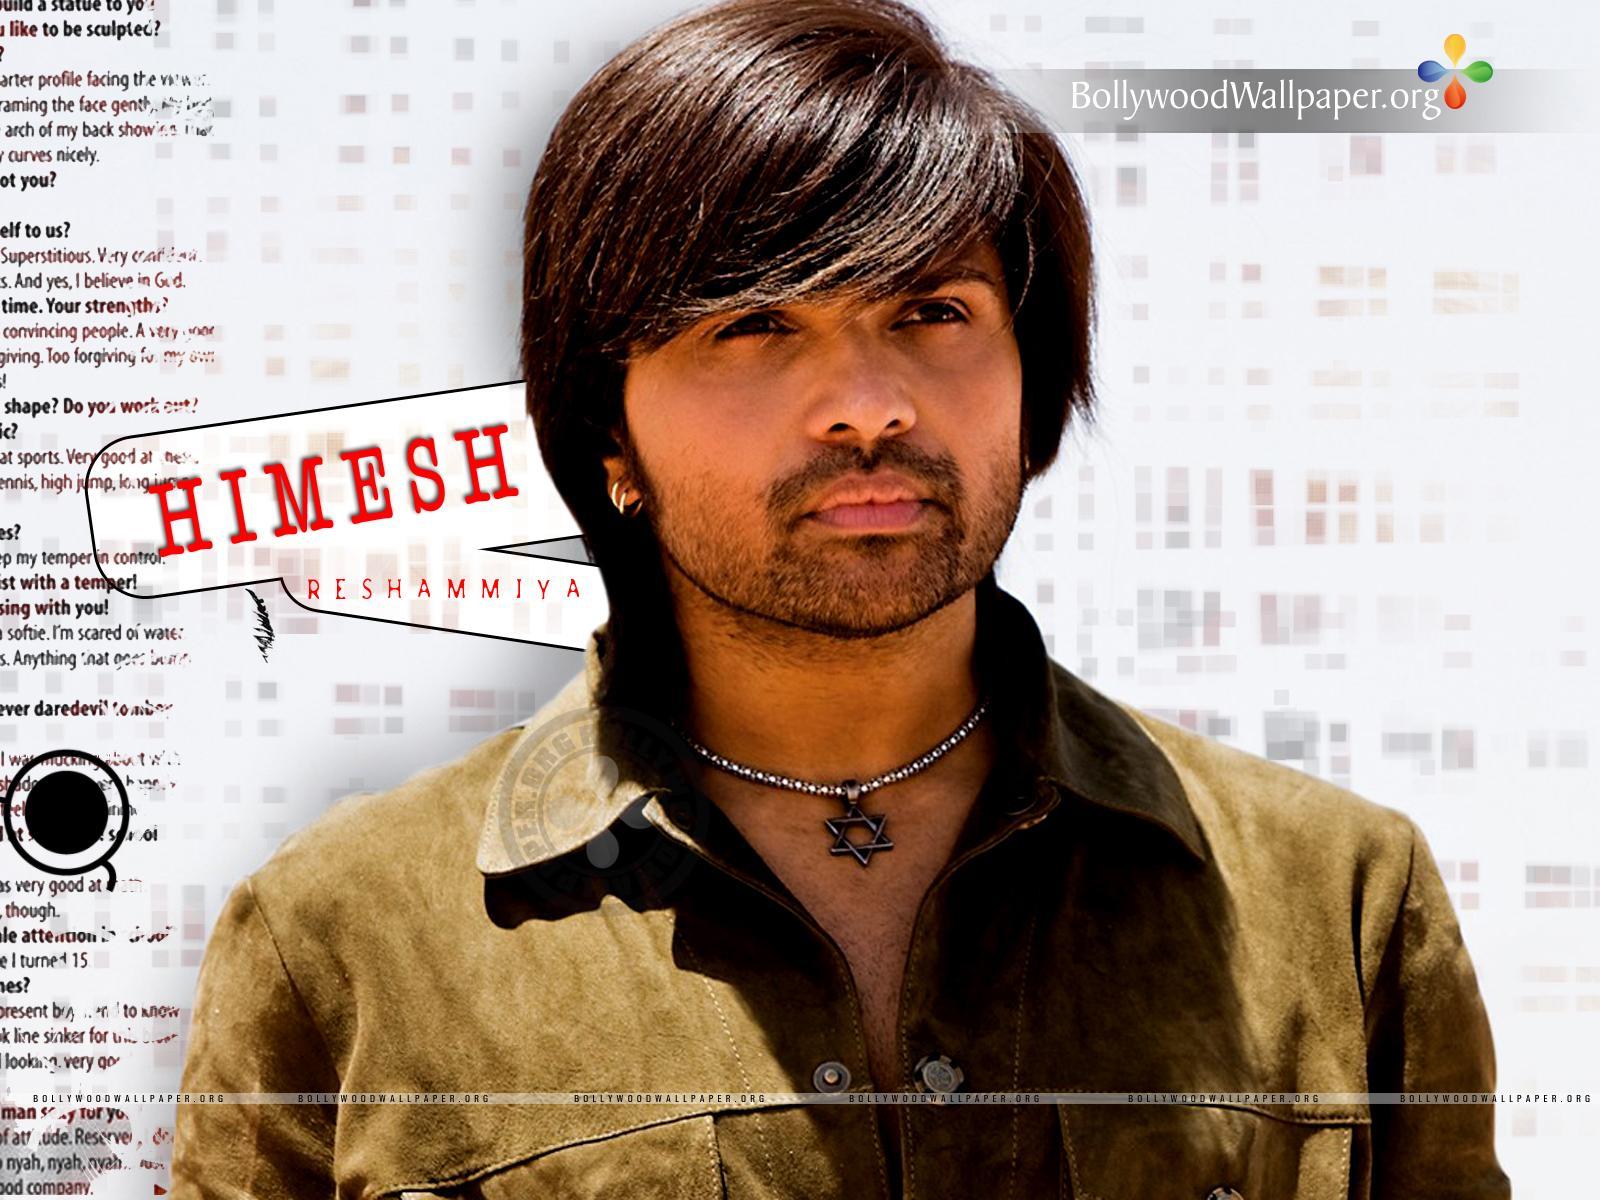 Himesh Reshammiya MP3 SONGS